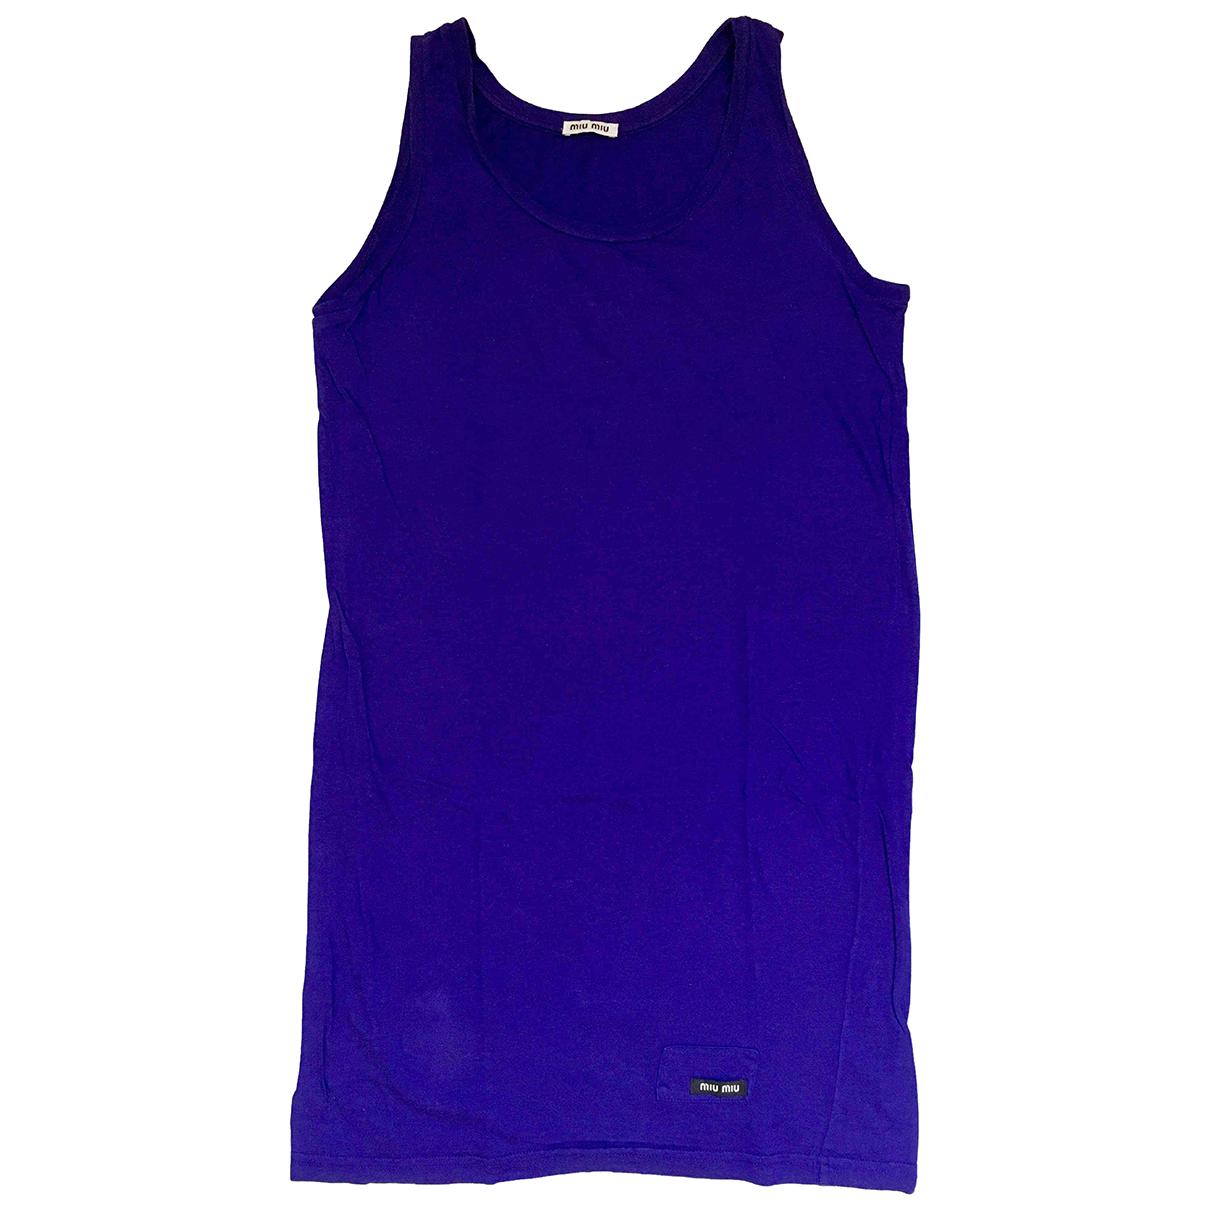 Miu Miu - Top   pour femme en coton - violet